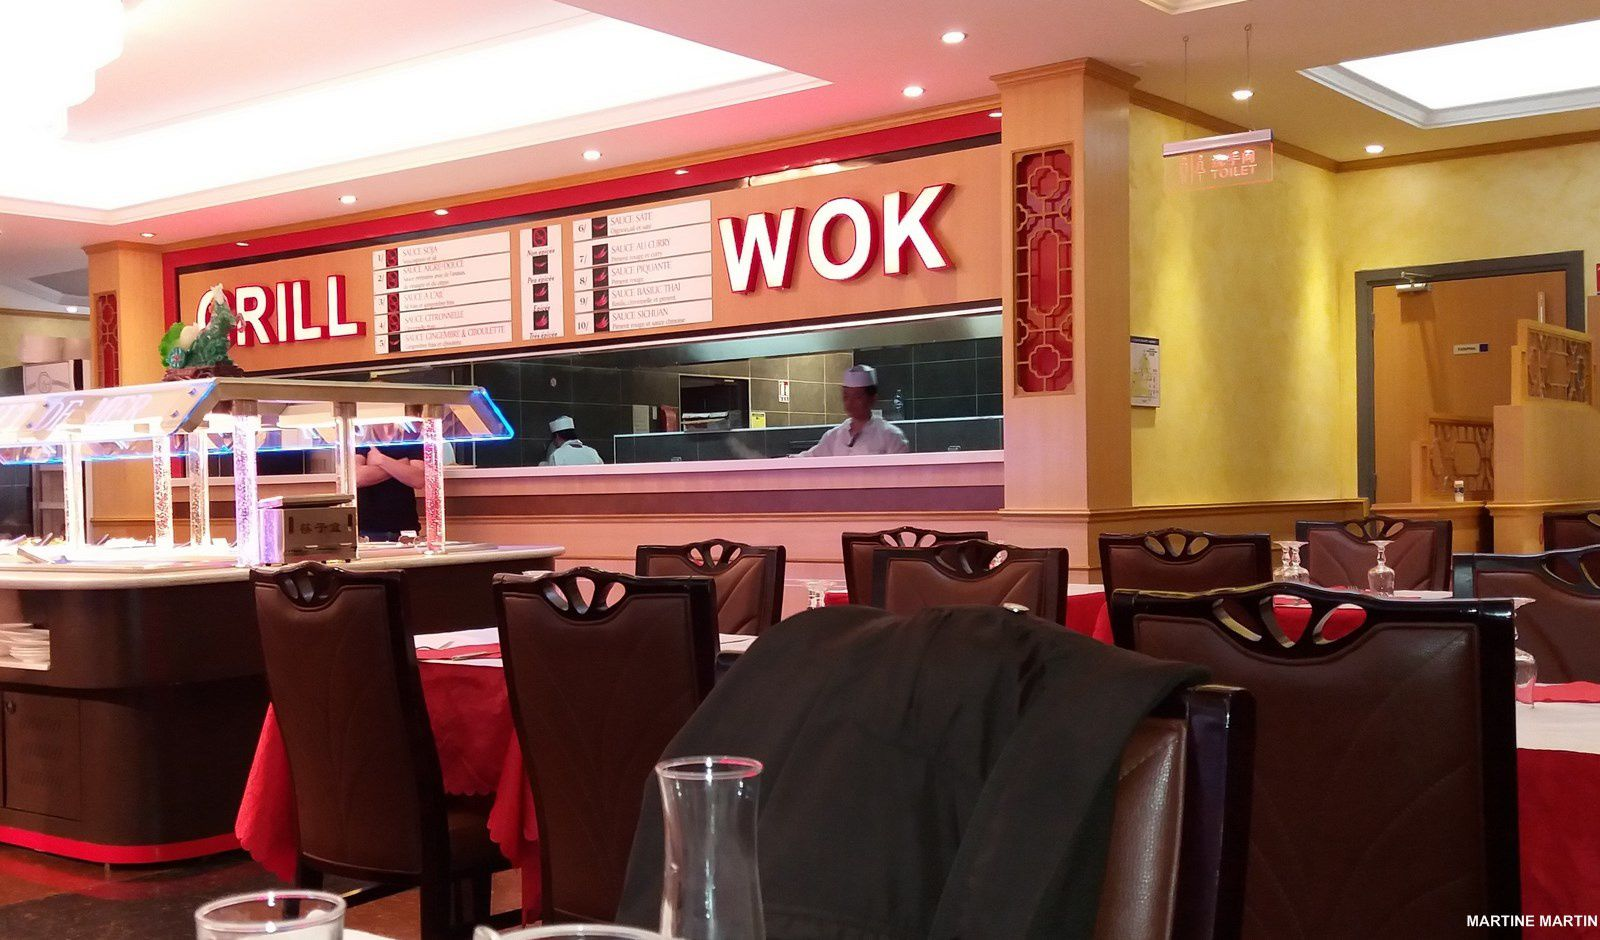 Restaurant asiatique Saveurs gourmandes Pontoise